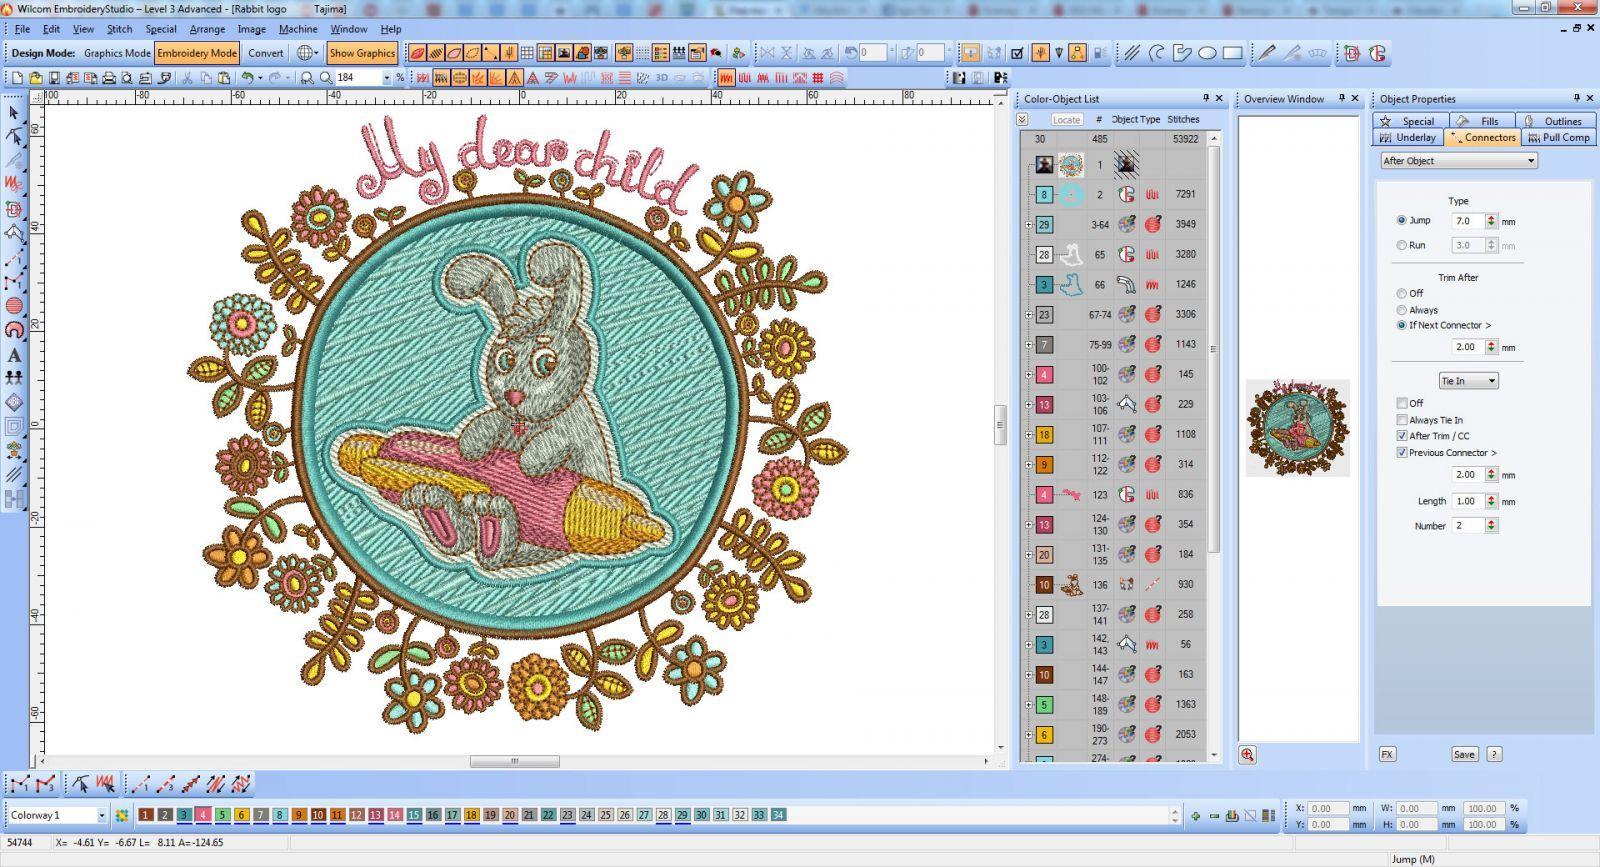 Cute Bunny - My Dear Child embroidery screenshot